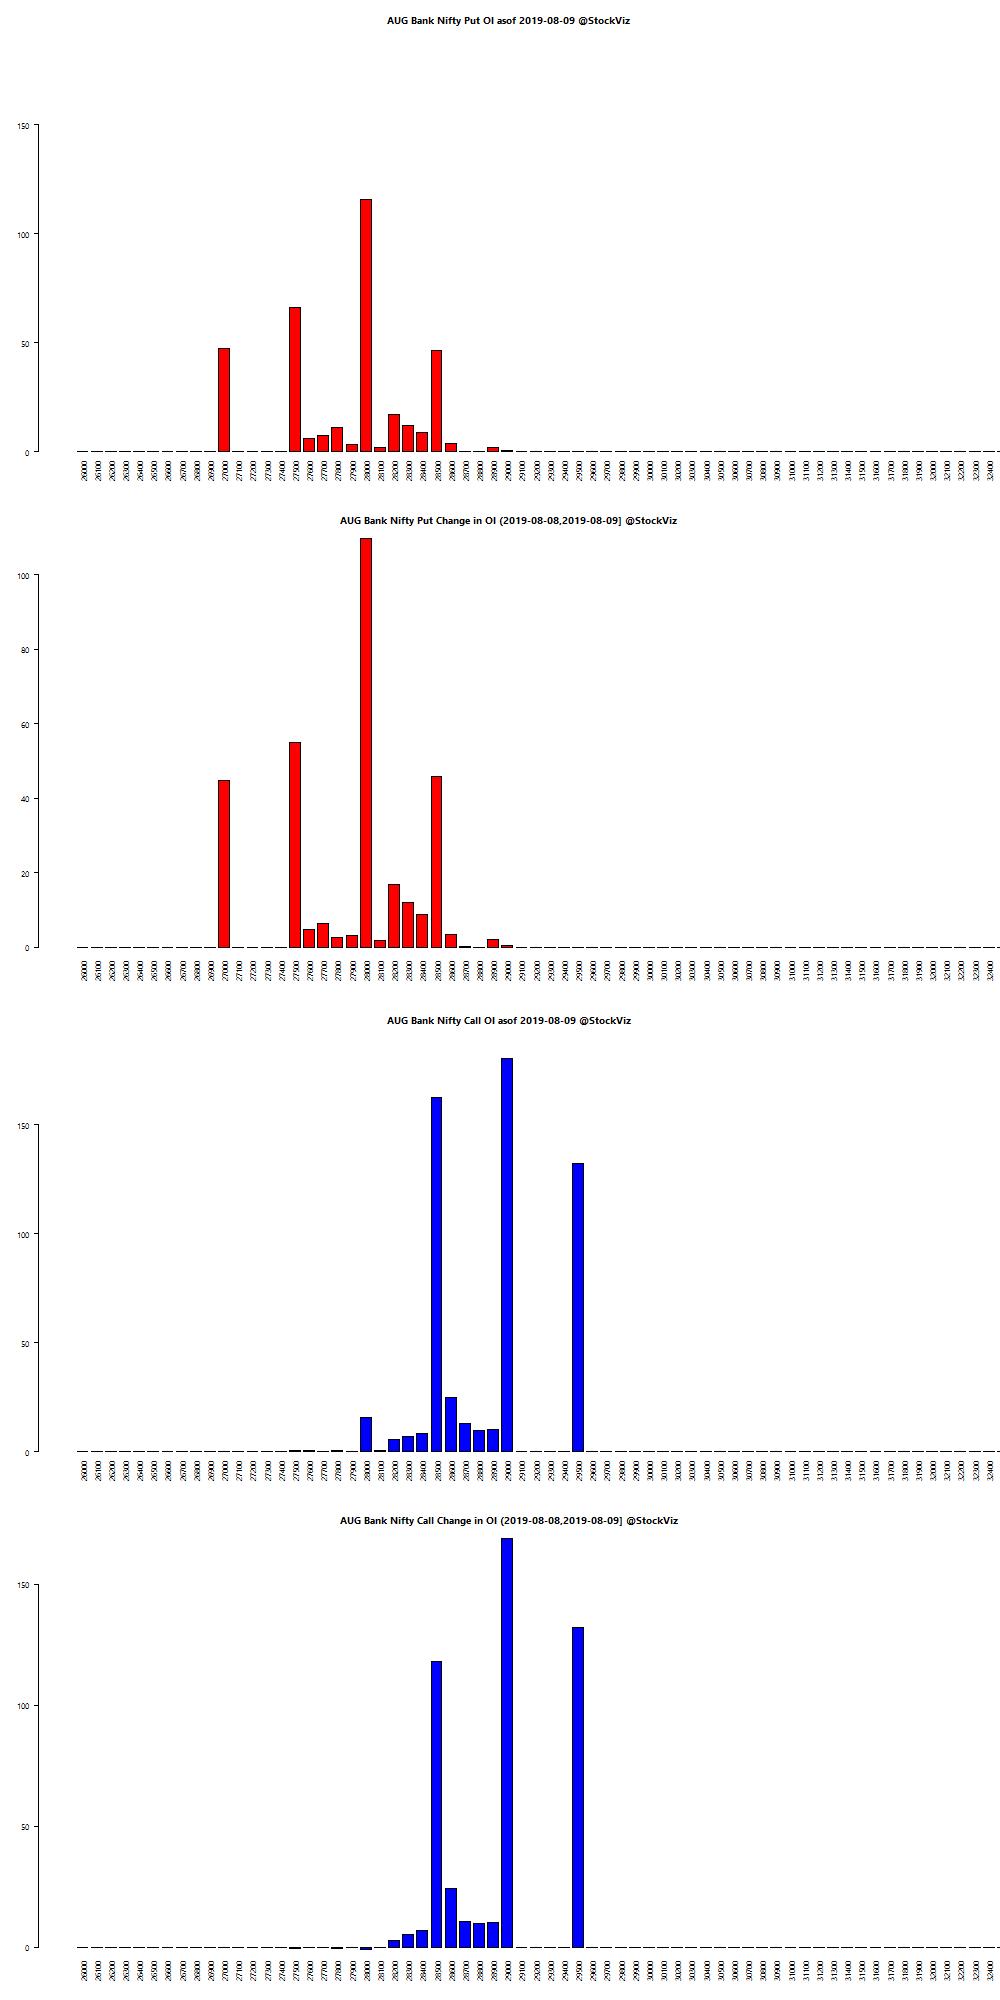 AUG BANKNIFTY OI chart